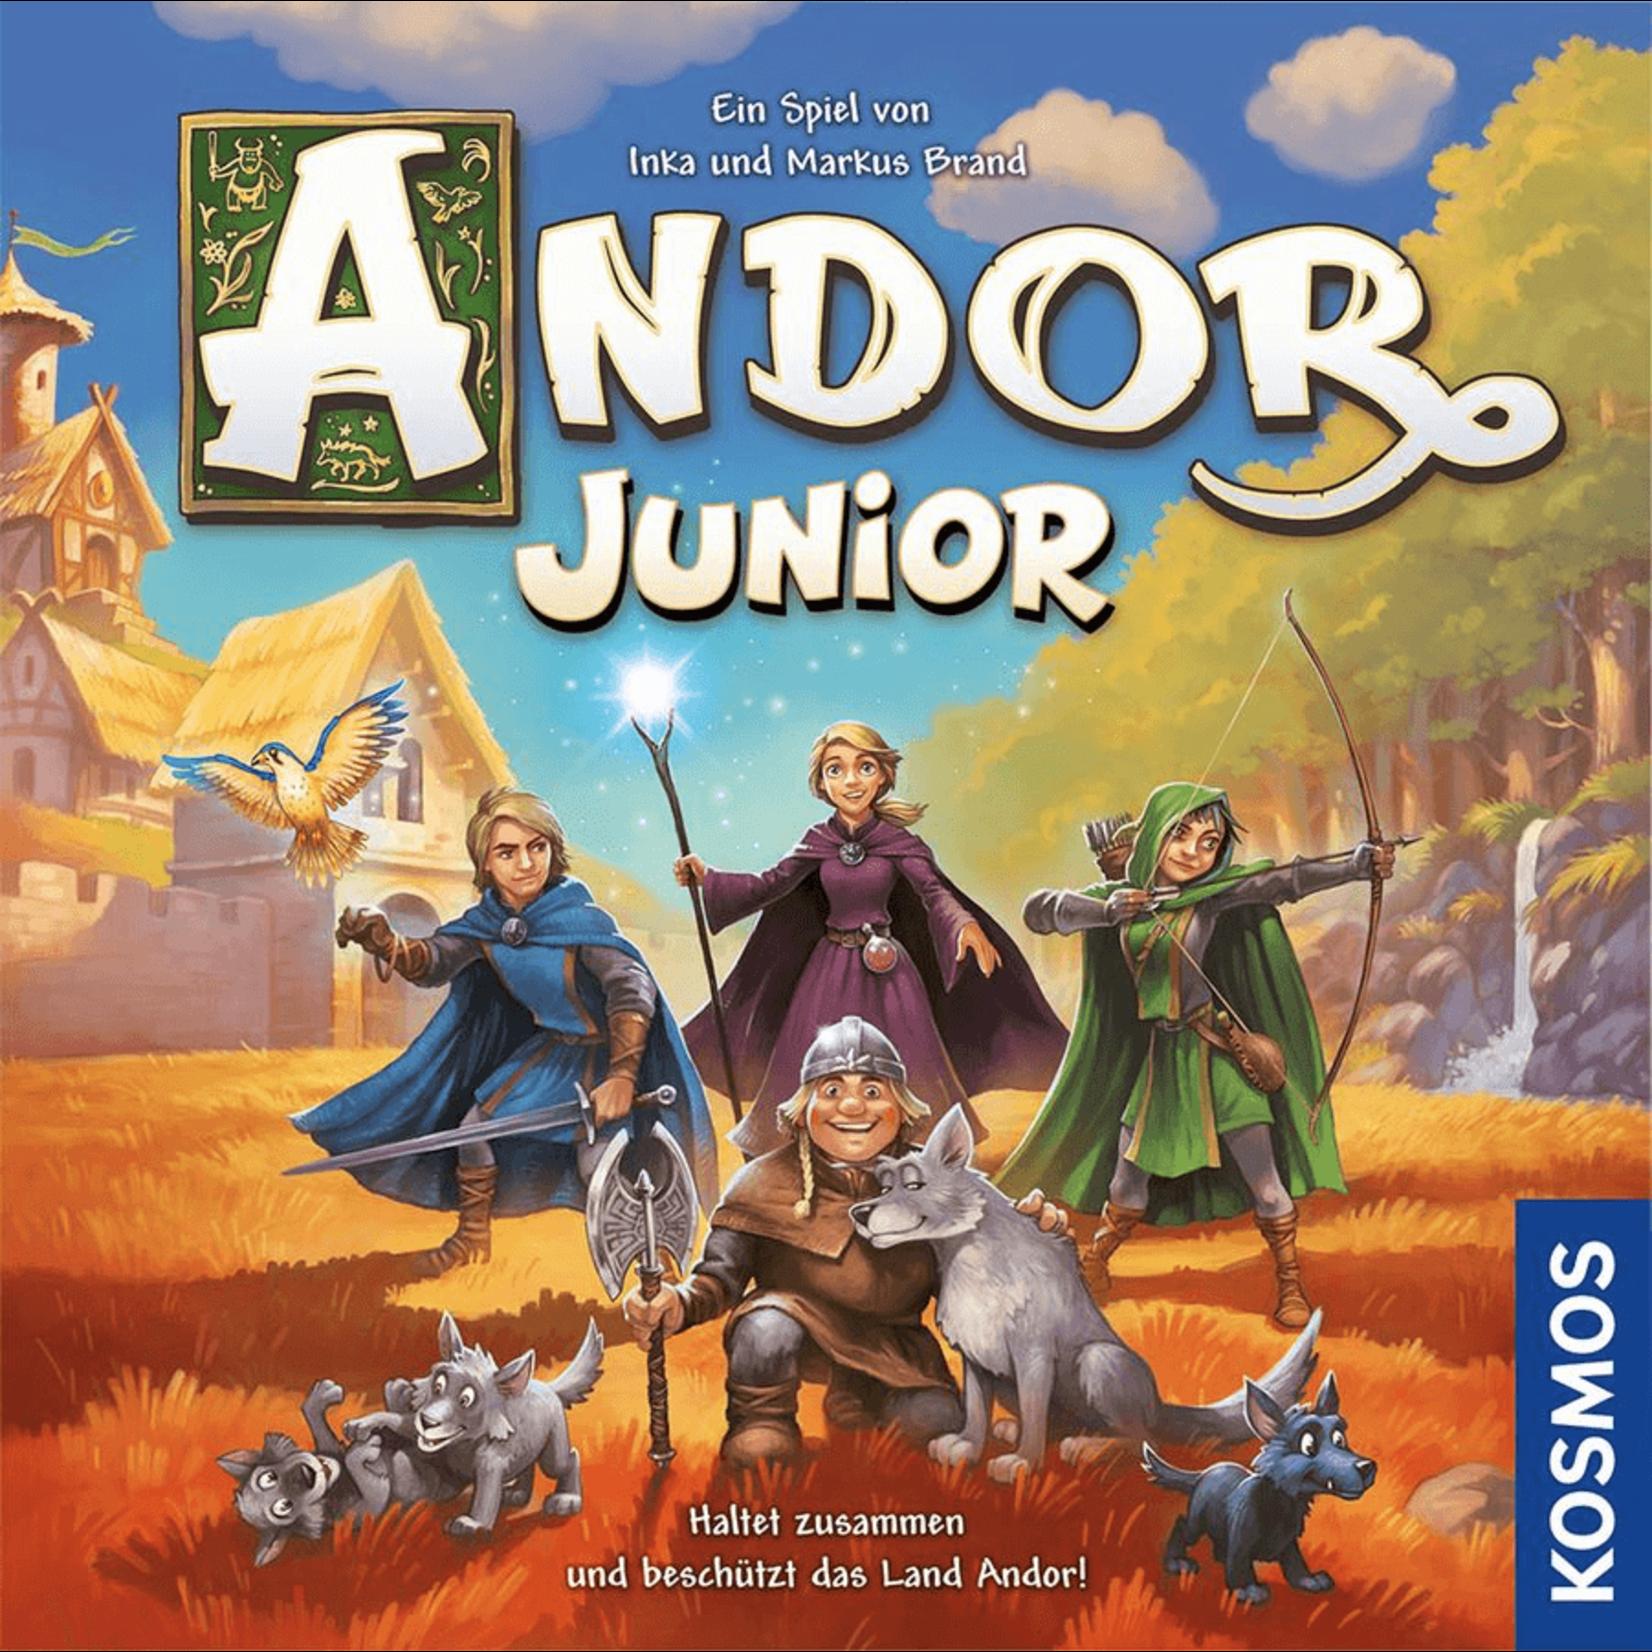 KOSMOS Andor: The Family Fantasy Game